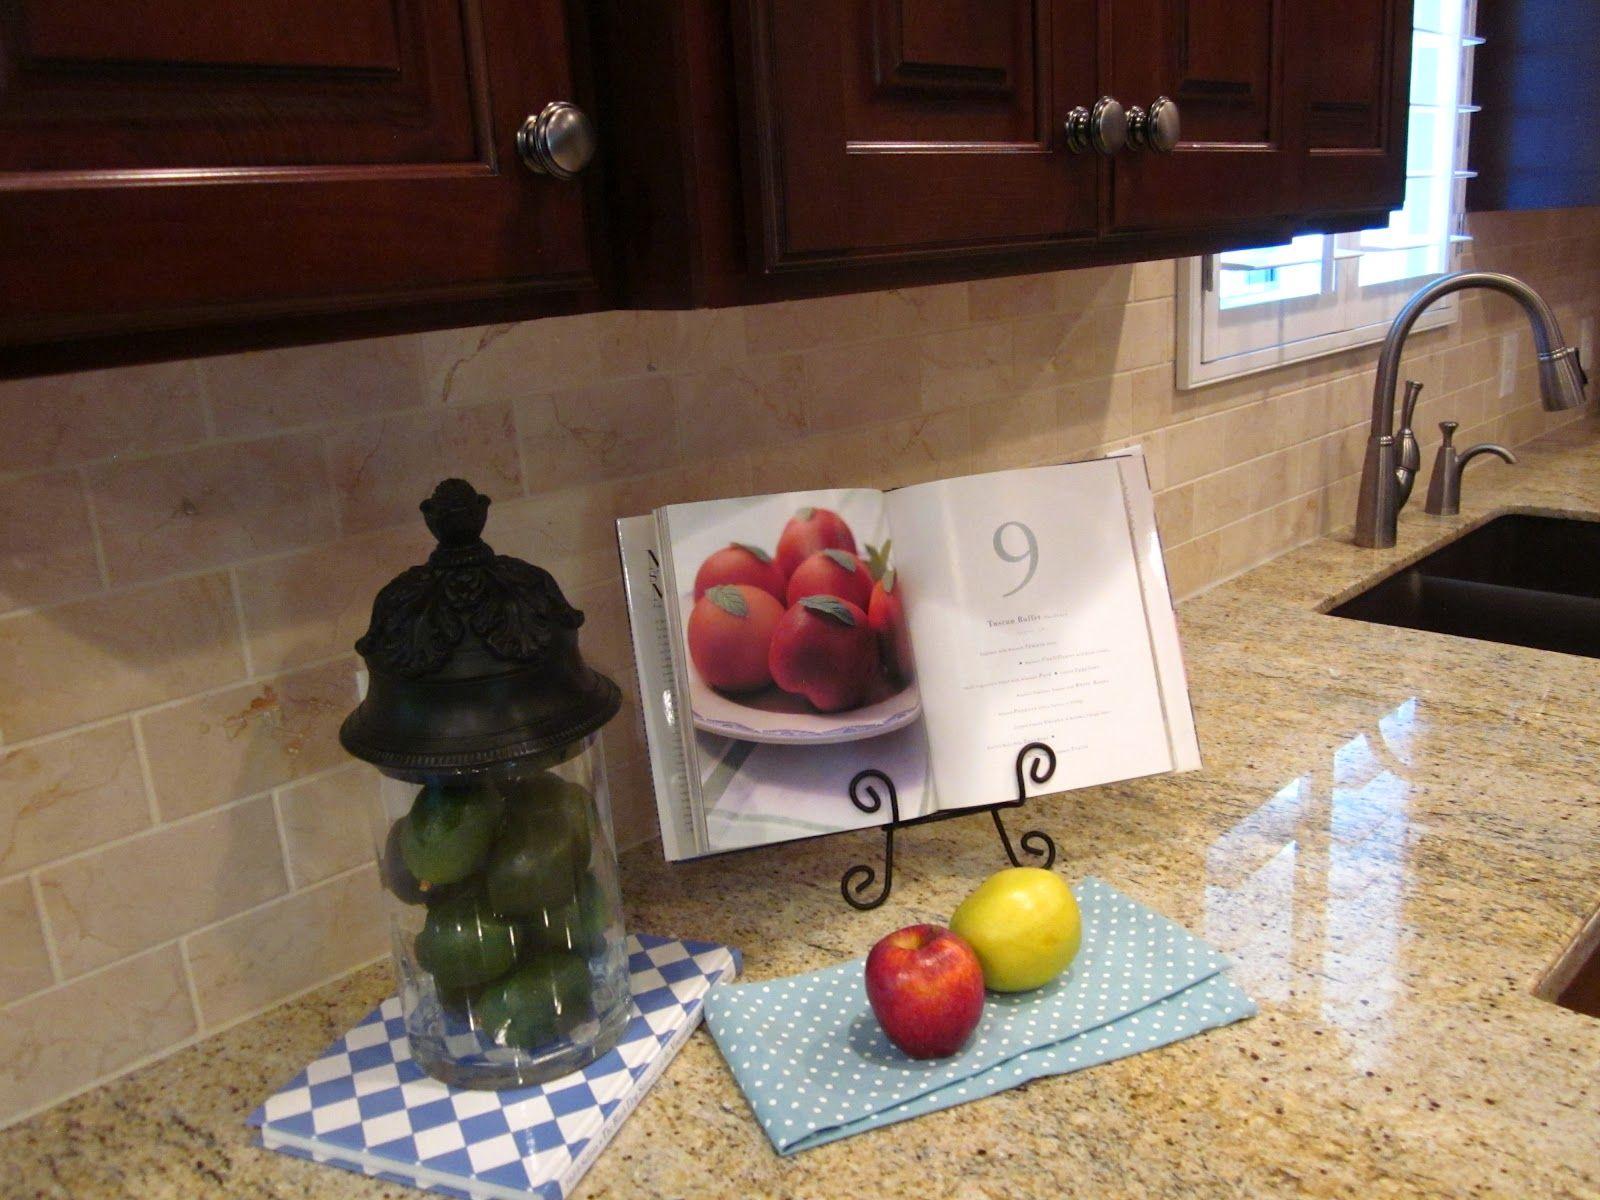 Honey I'm Home: A Spectacular Kitchen Remodel